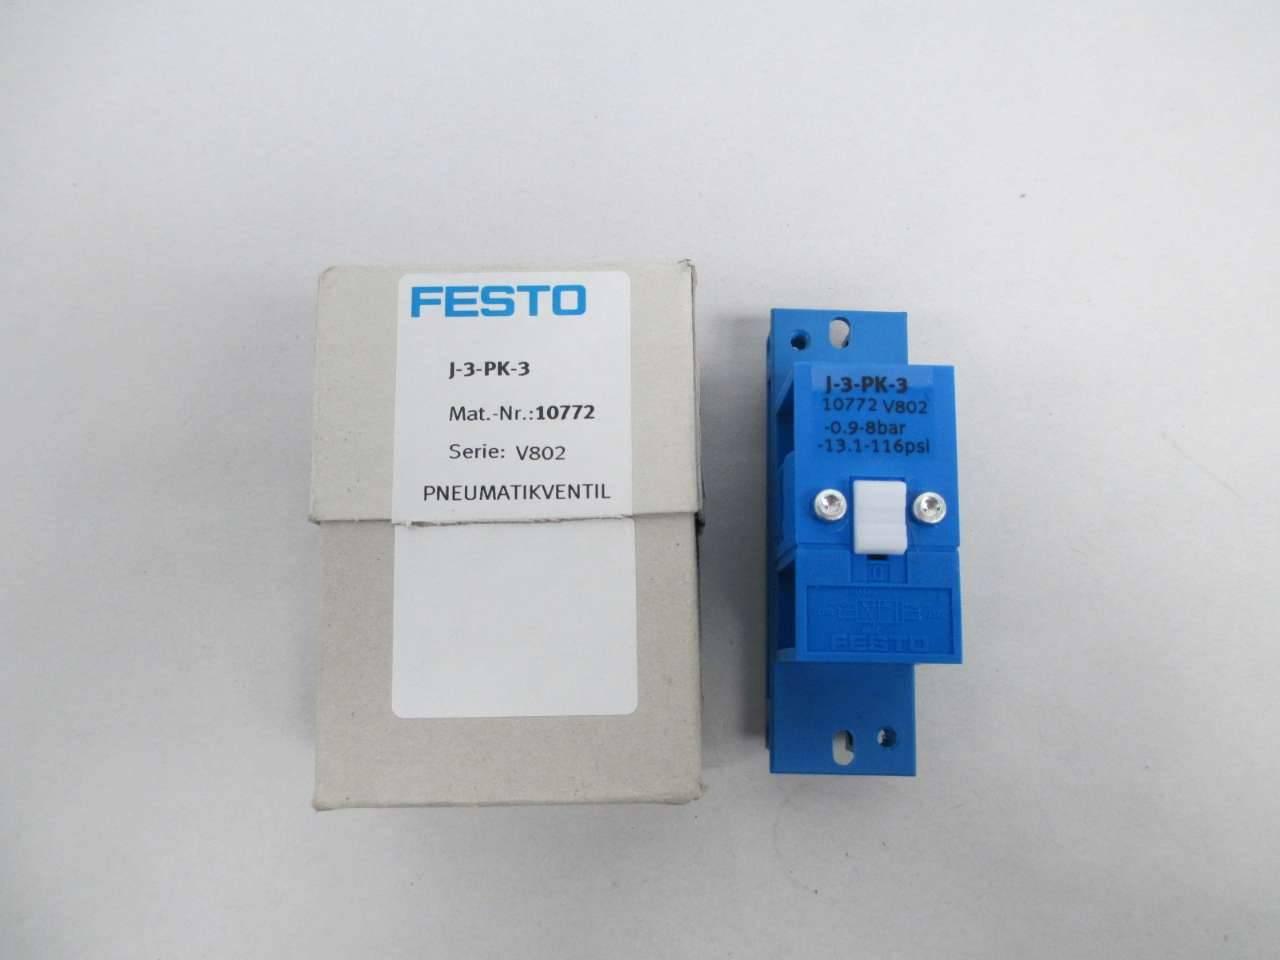 Festo JD-5-PK-3  Luftimpulsventil                                        E156//19